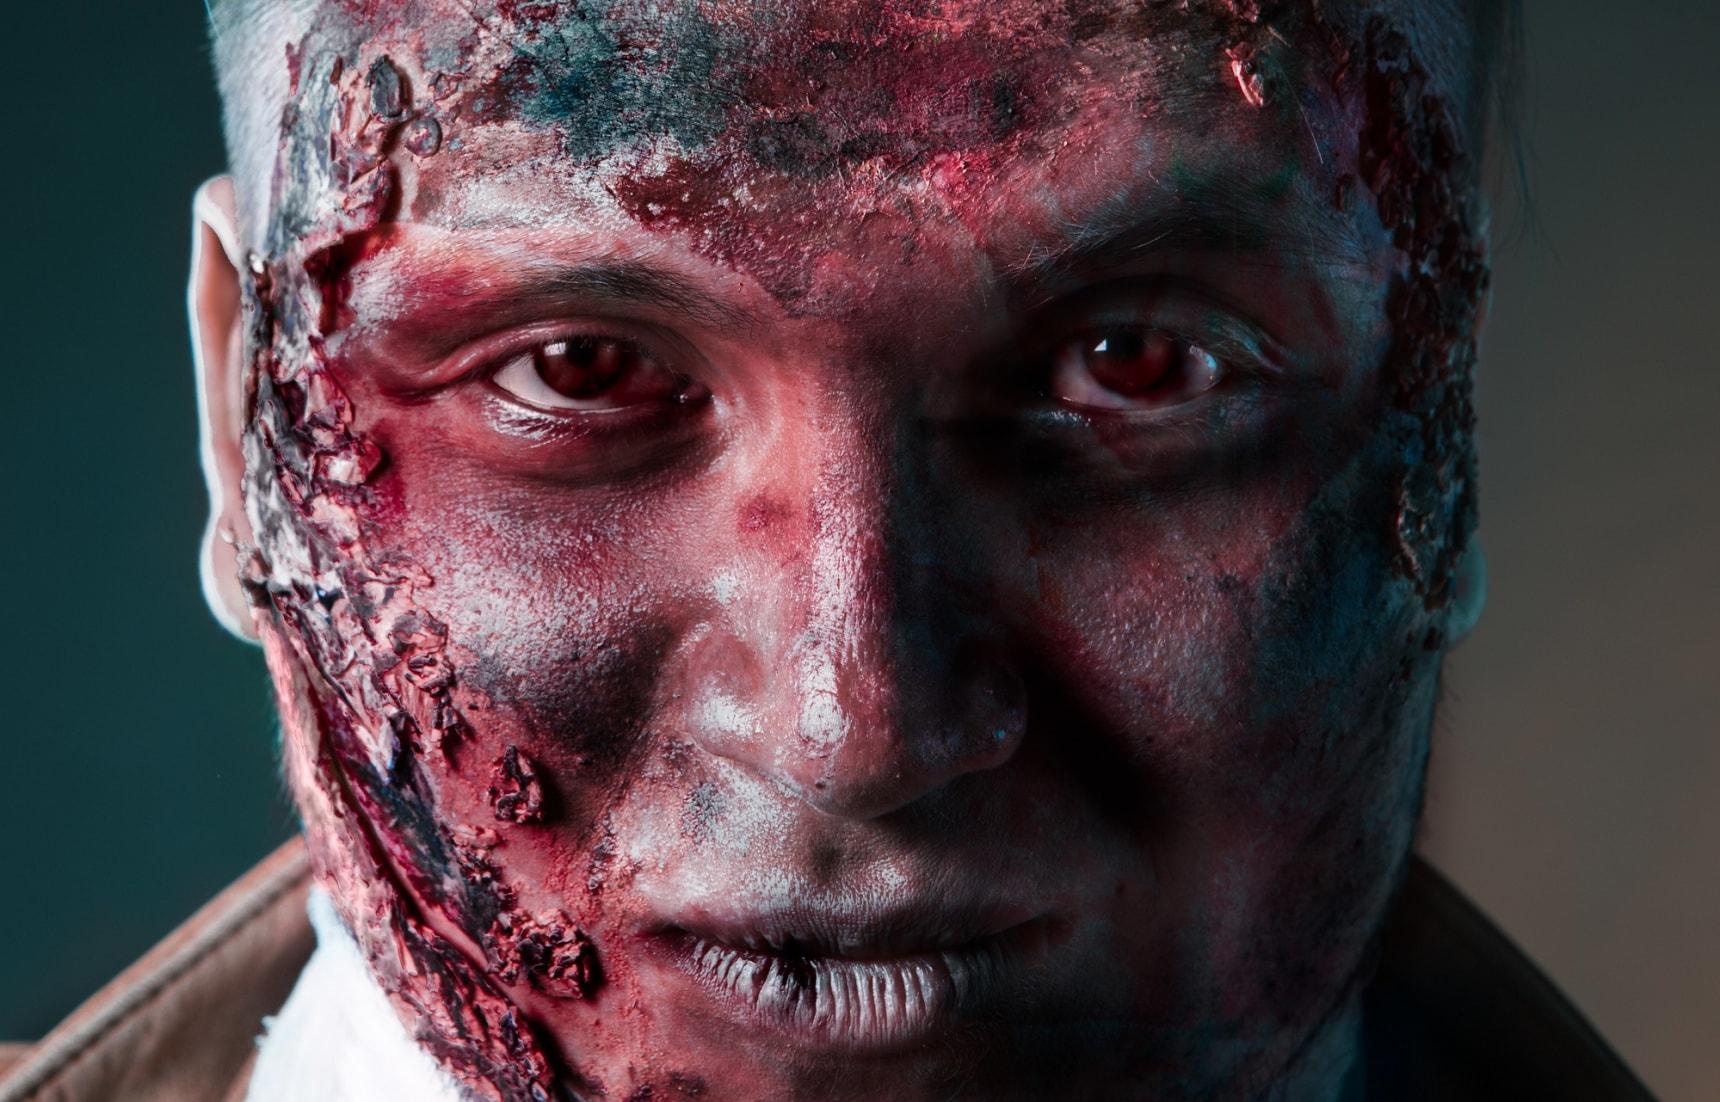 6 Truly Horrifying Halloween Makeup Ideas